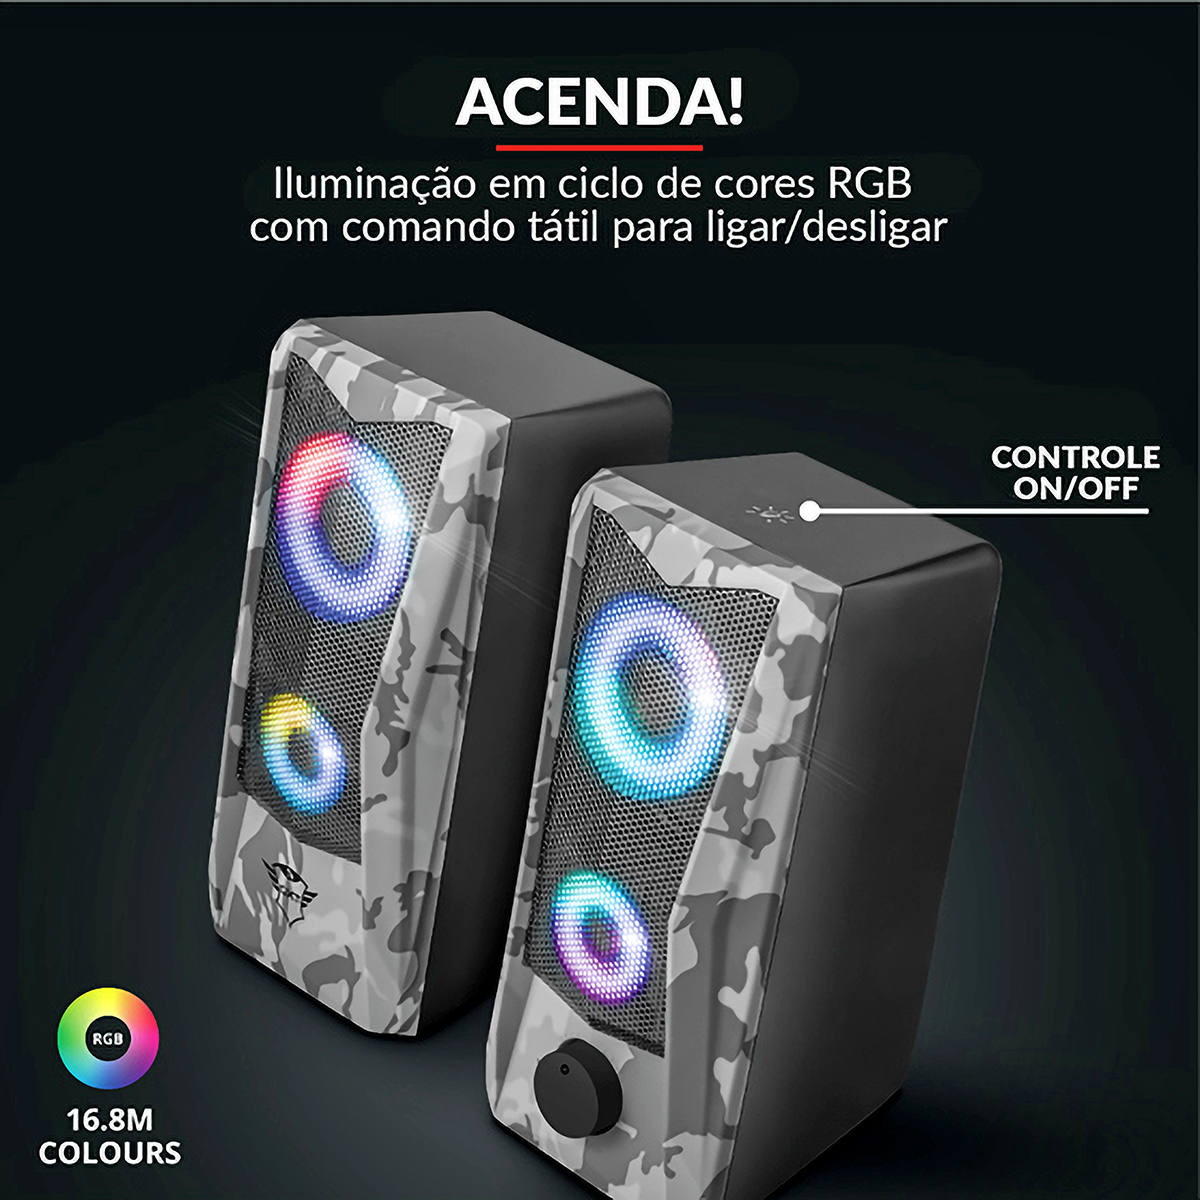 Caixa de Som Illuminated 2.0 Estéreo Speaker Set 6W RMS Grelha Metálica Trust GXT 606 Javv Camuflado